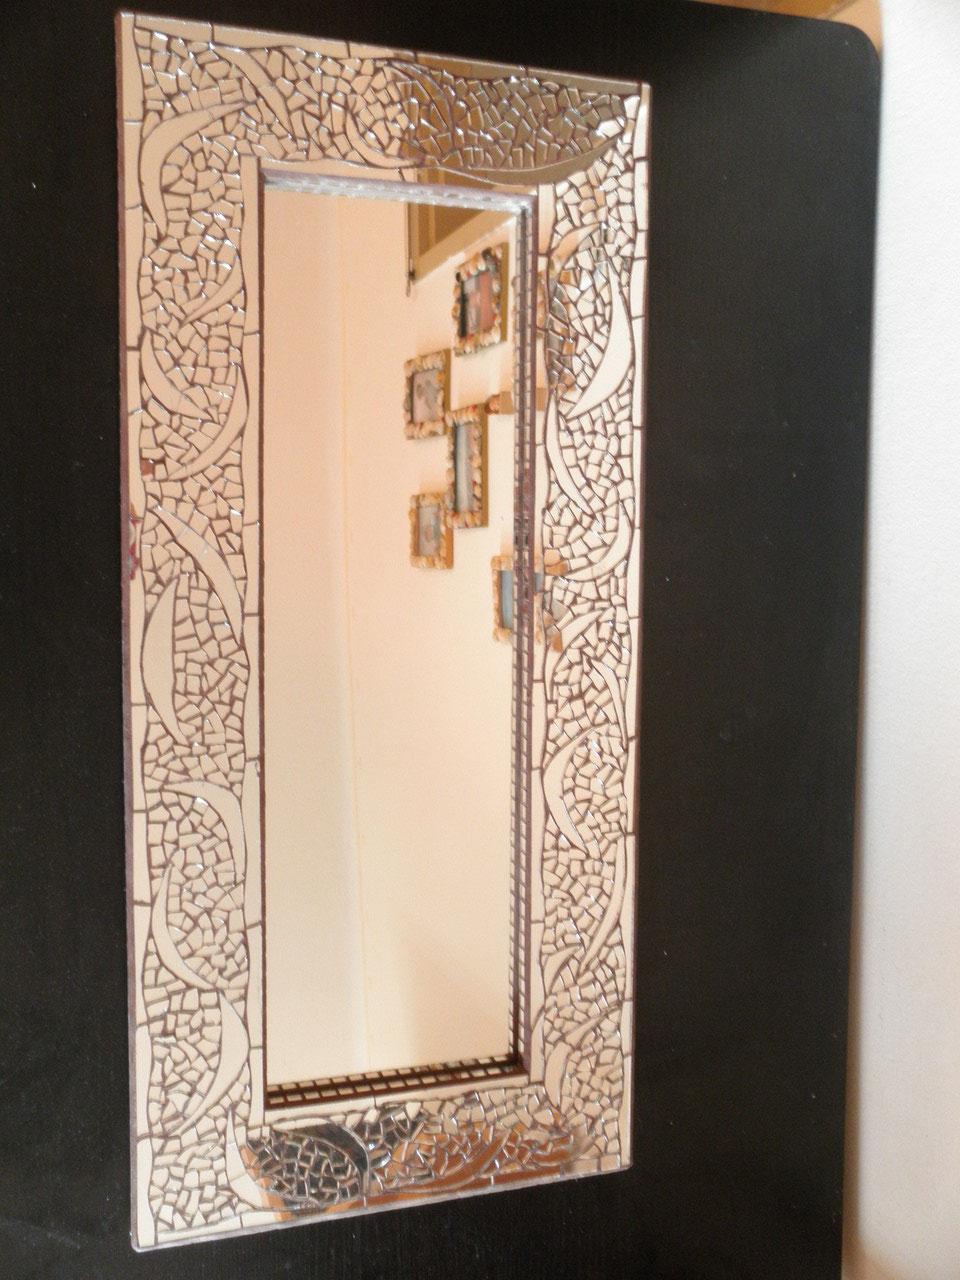 mosaik kunstwerke bibimosaics webseite. Black Bedroom Furniture Sets. Home Design Ideas